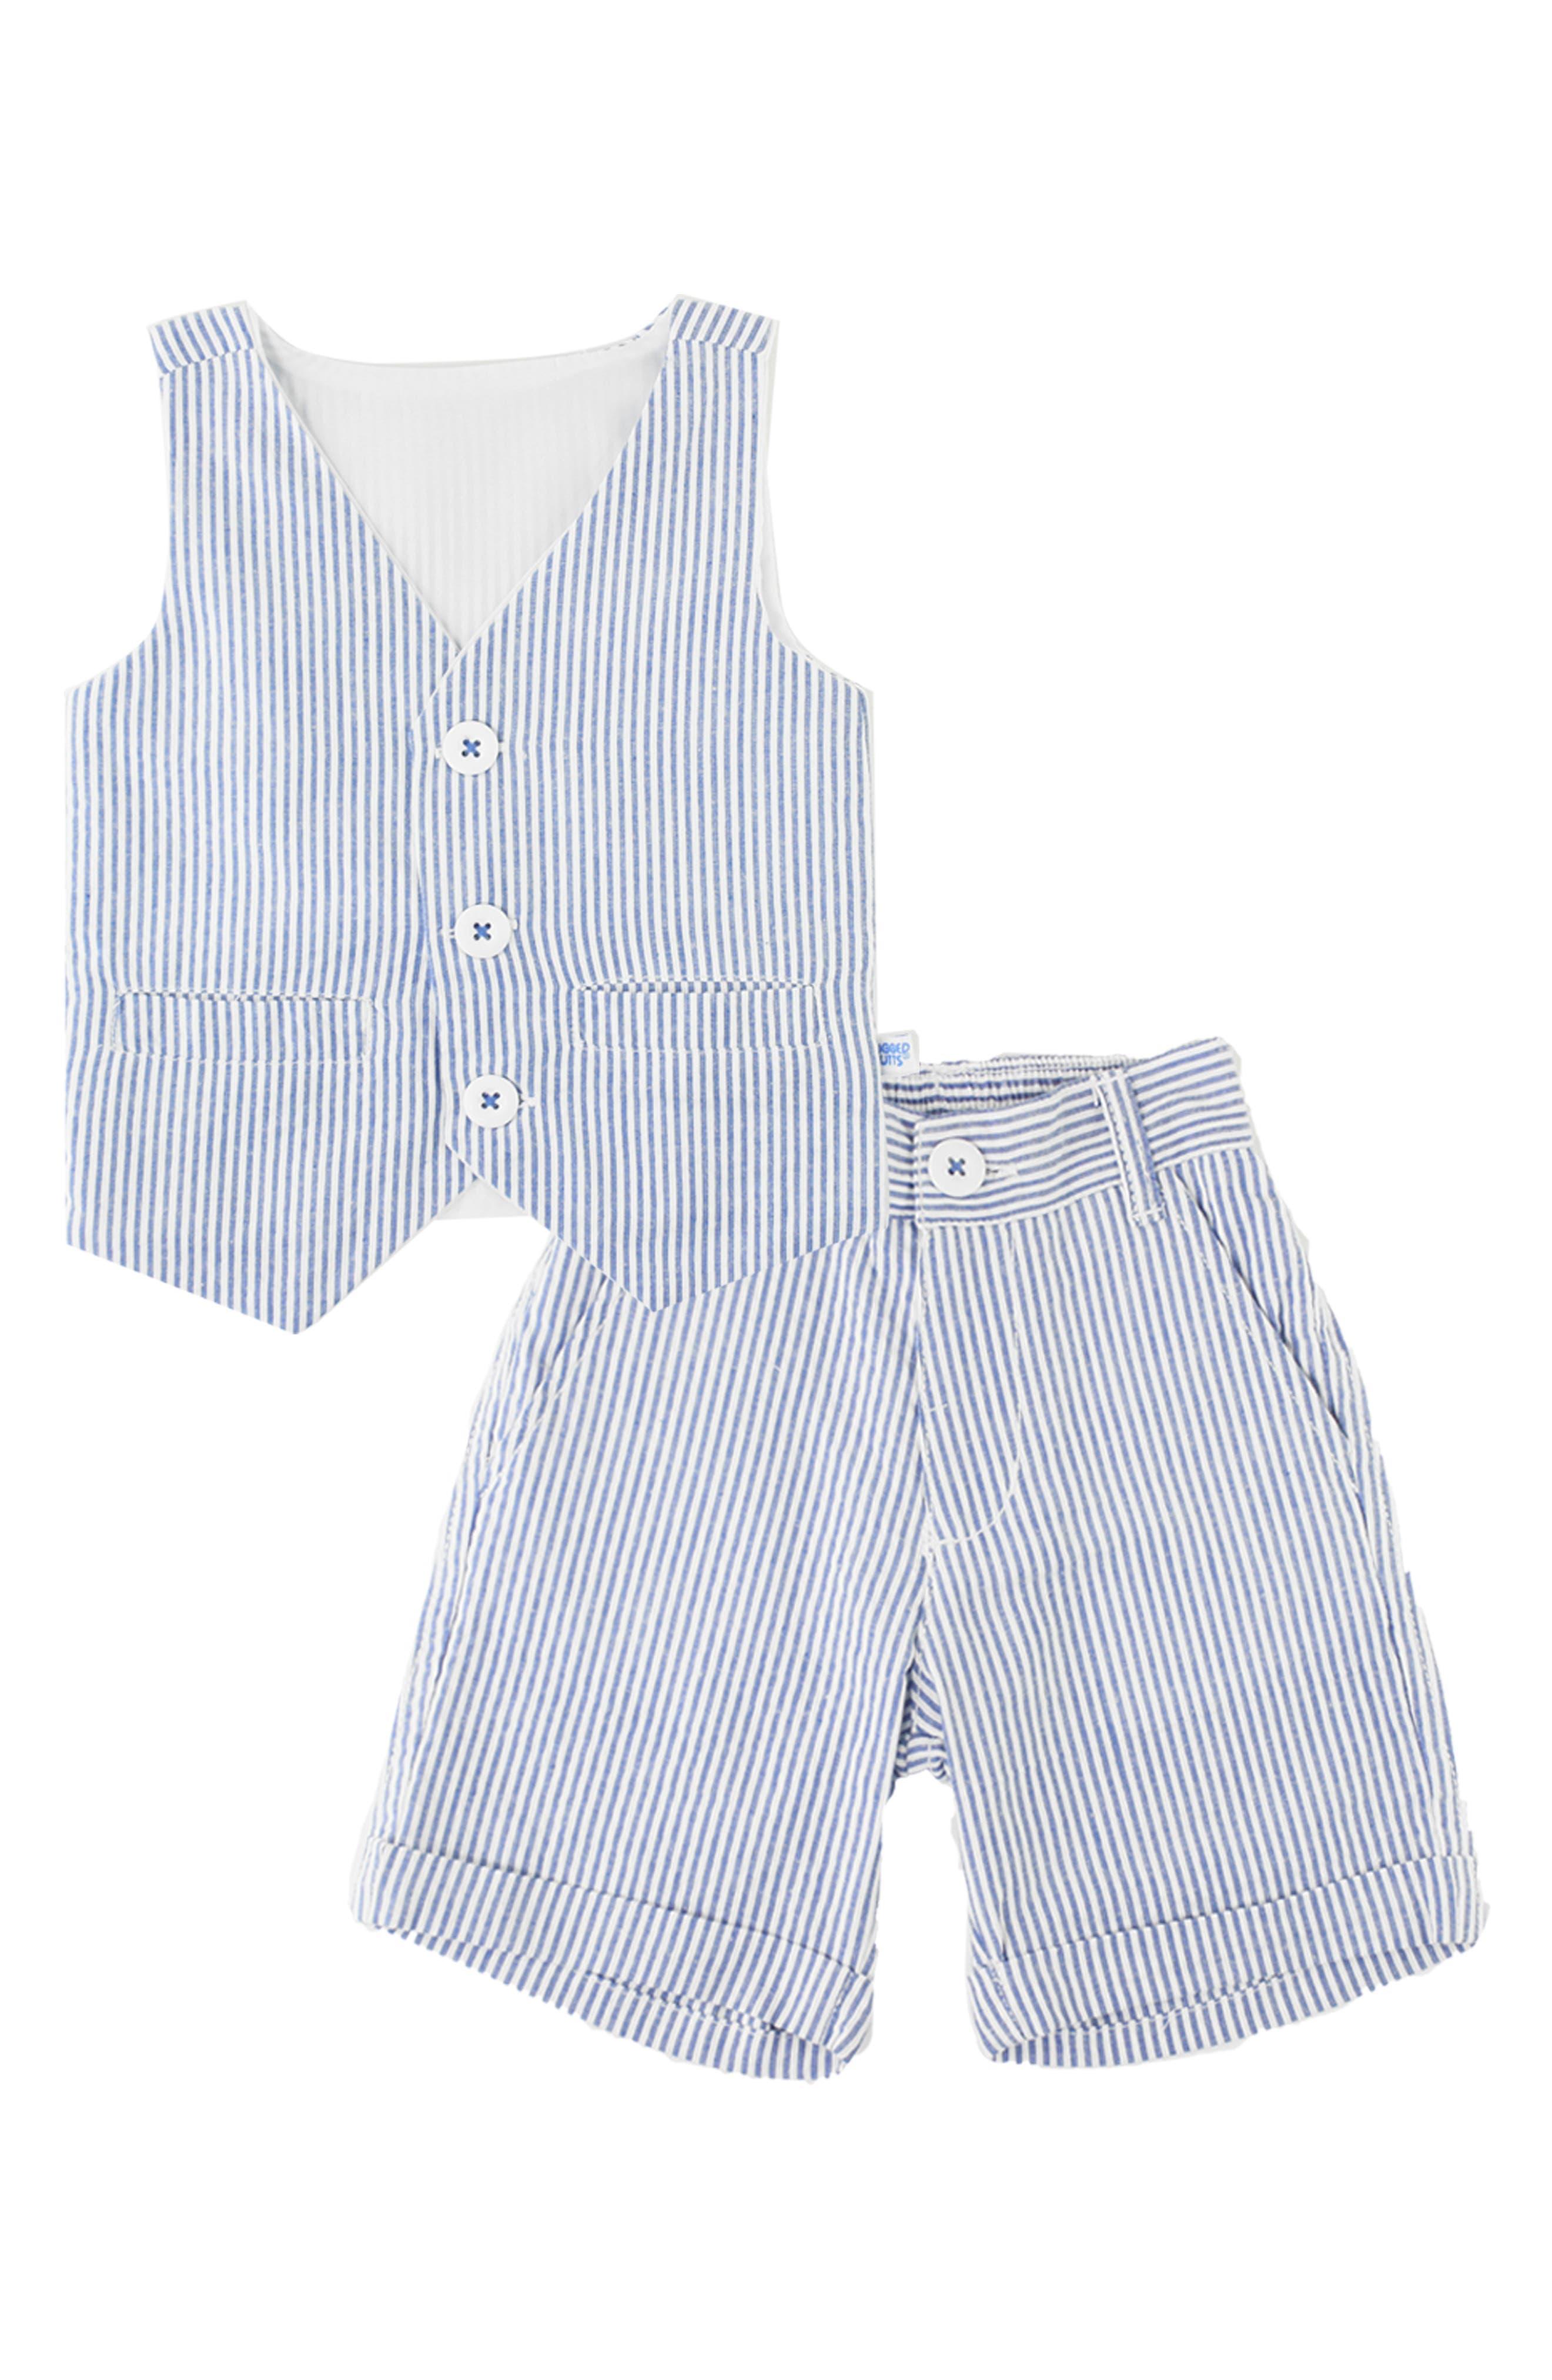 Seersucker Vest & Shorts Set,                         Main,                         color, BLUE